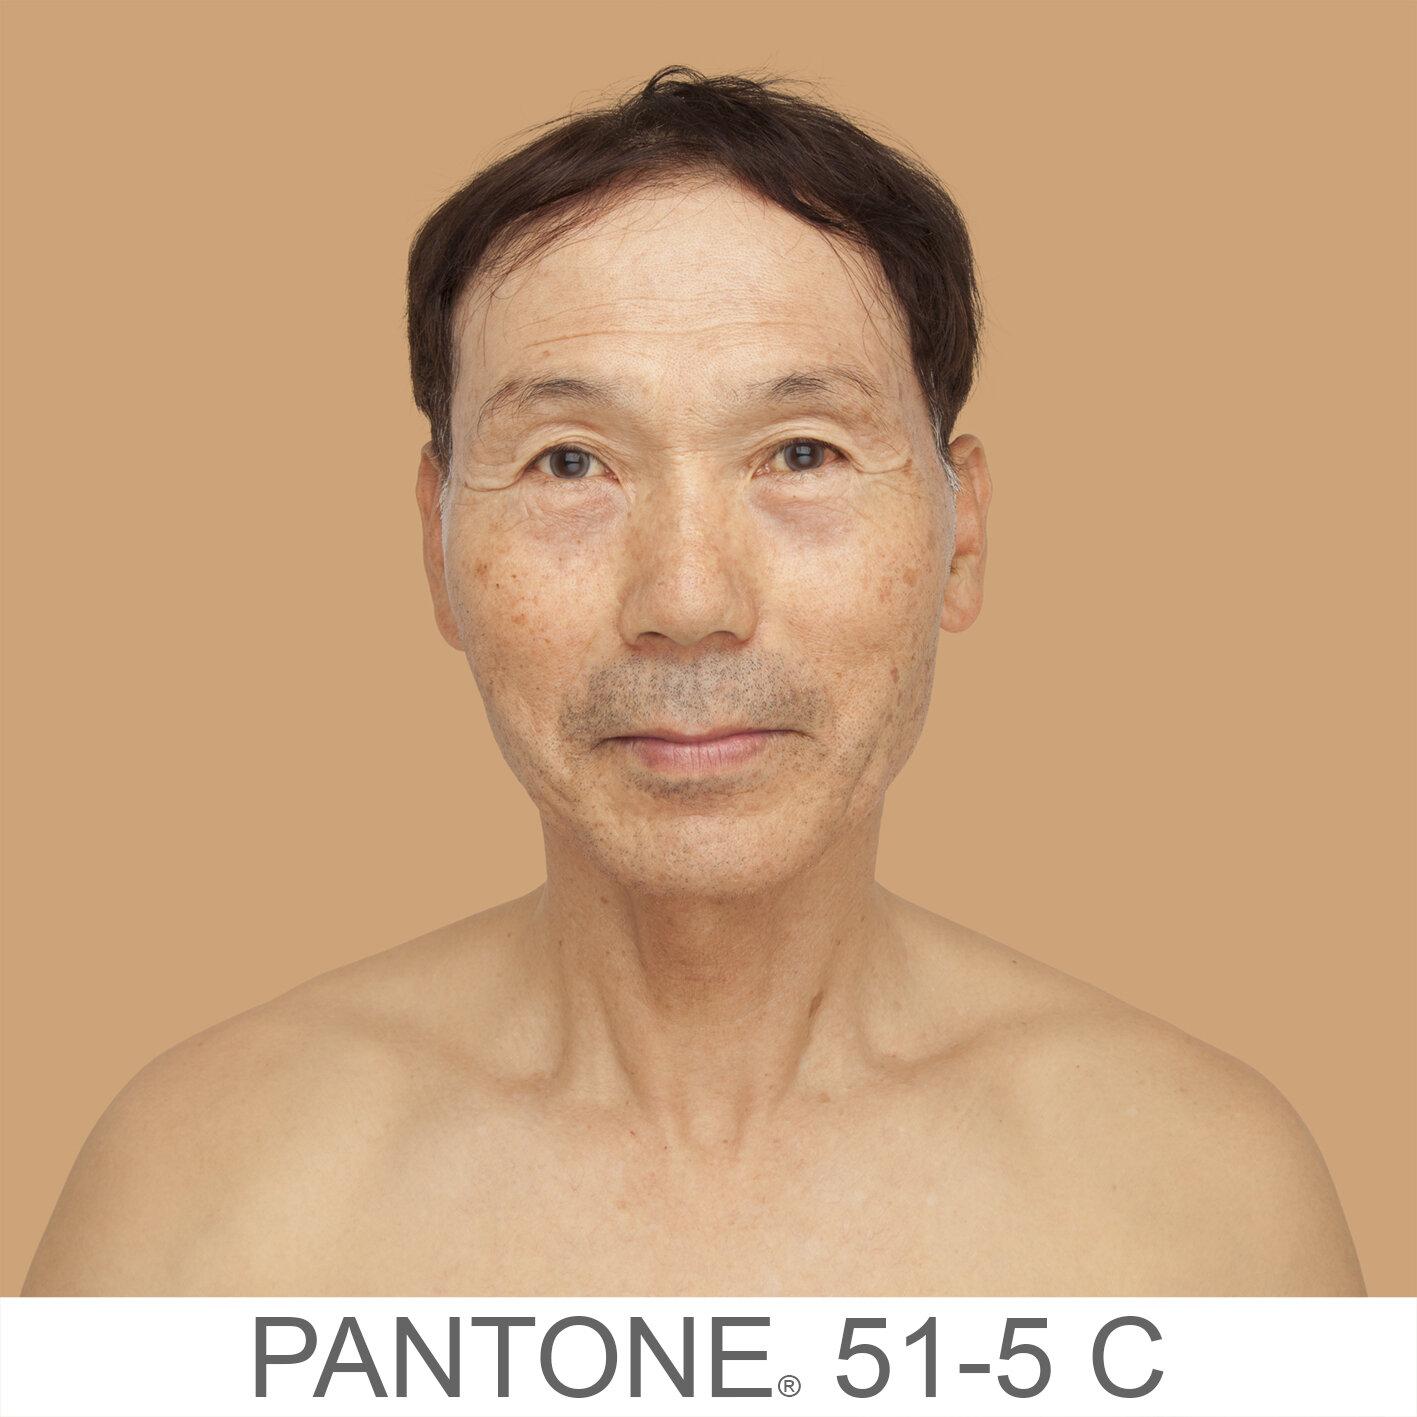 humanae 51-5 C KO copia.jpg